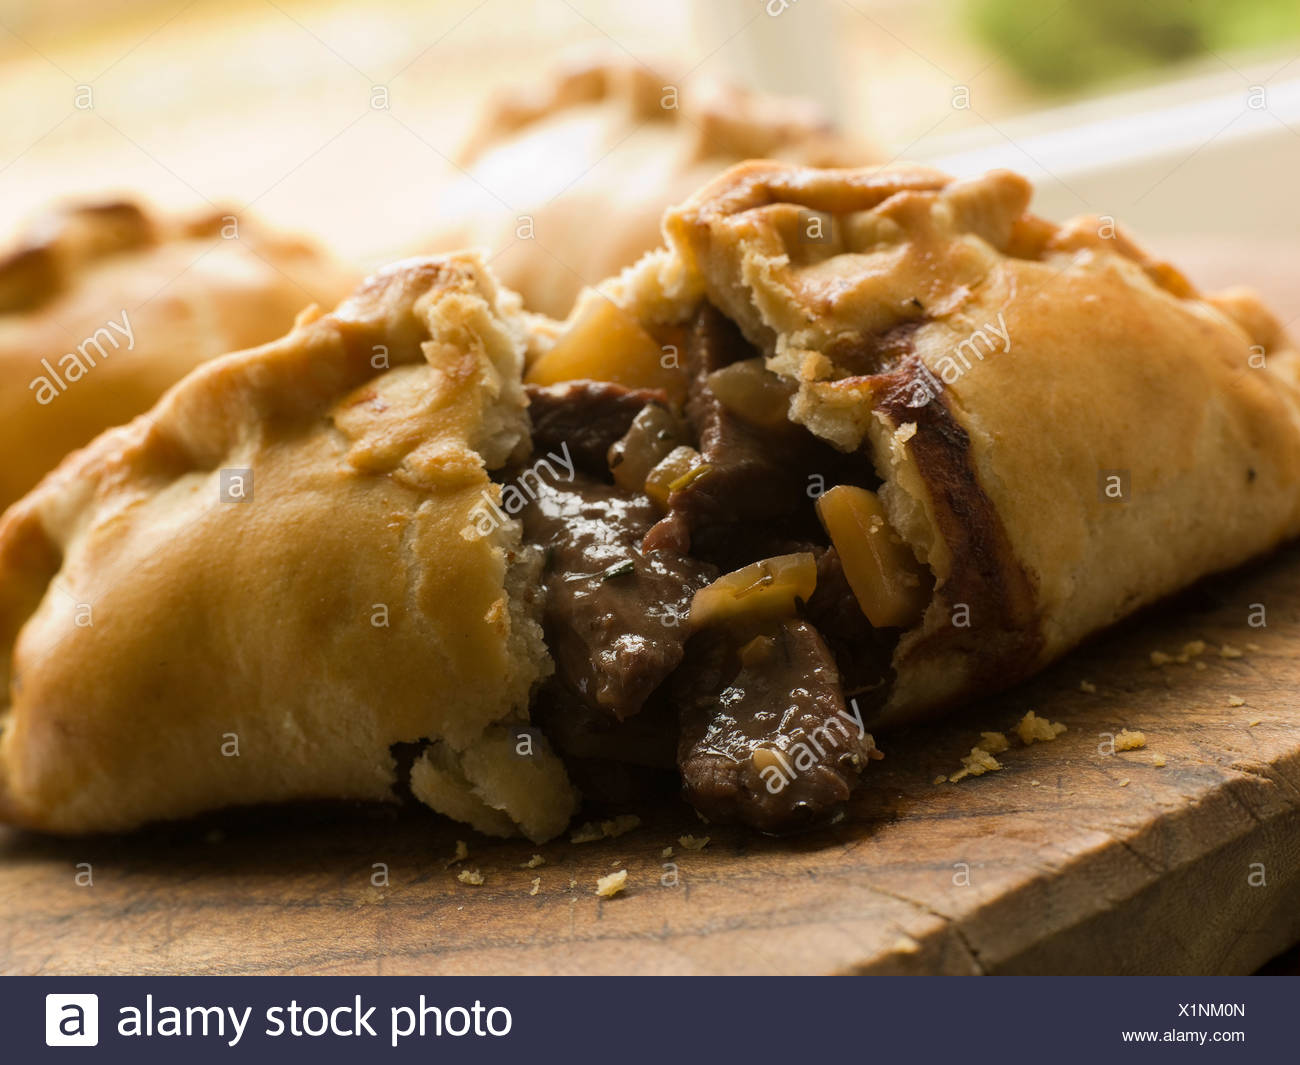 Traditional Cornish Pasty broken open - Stock Image